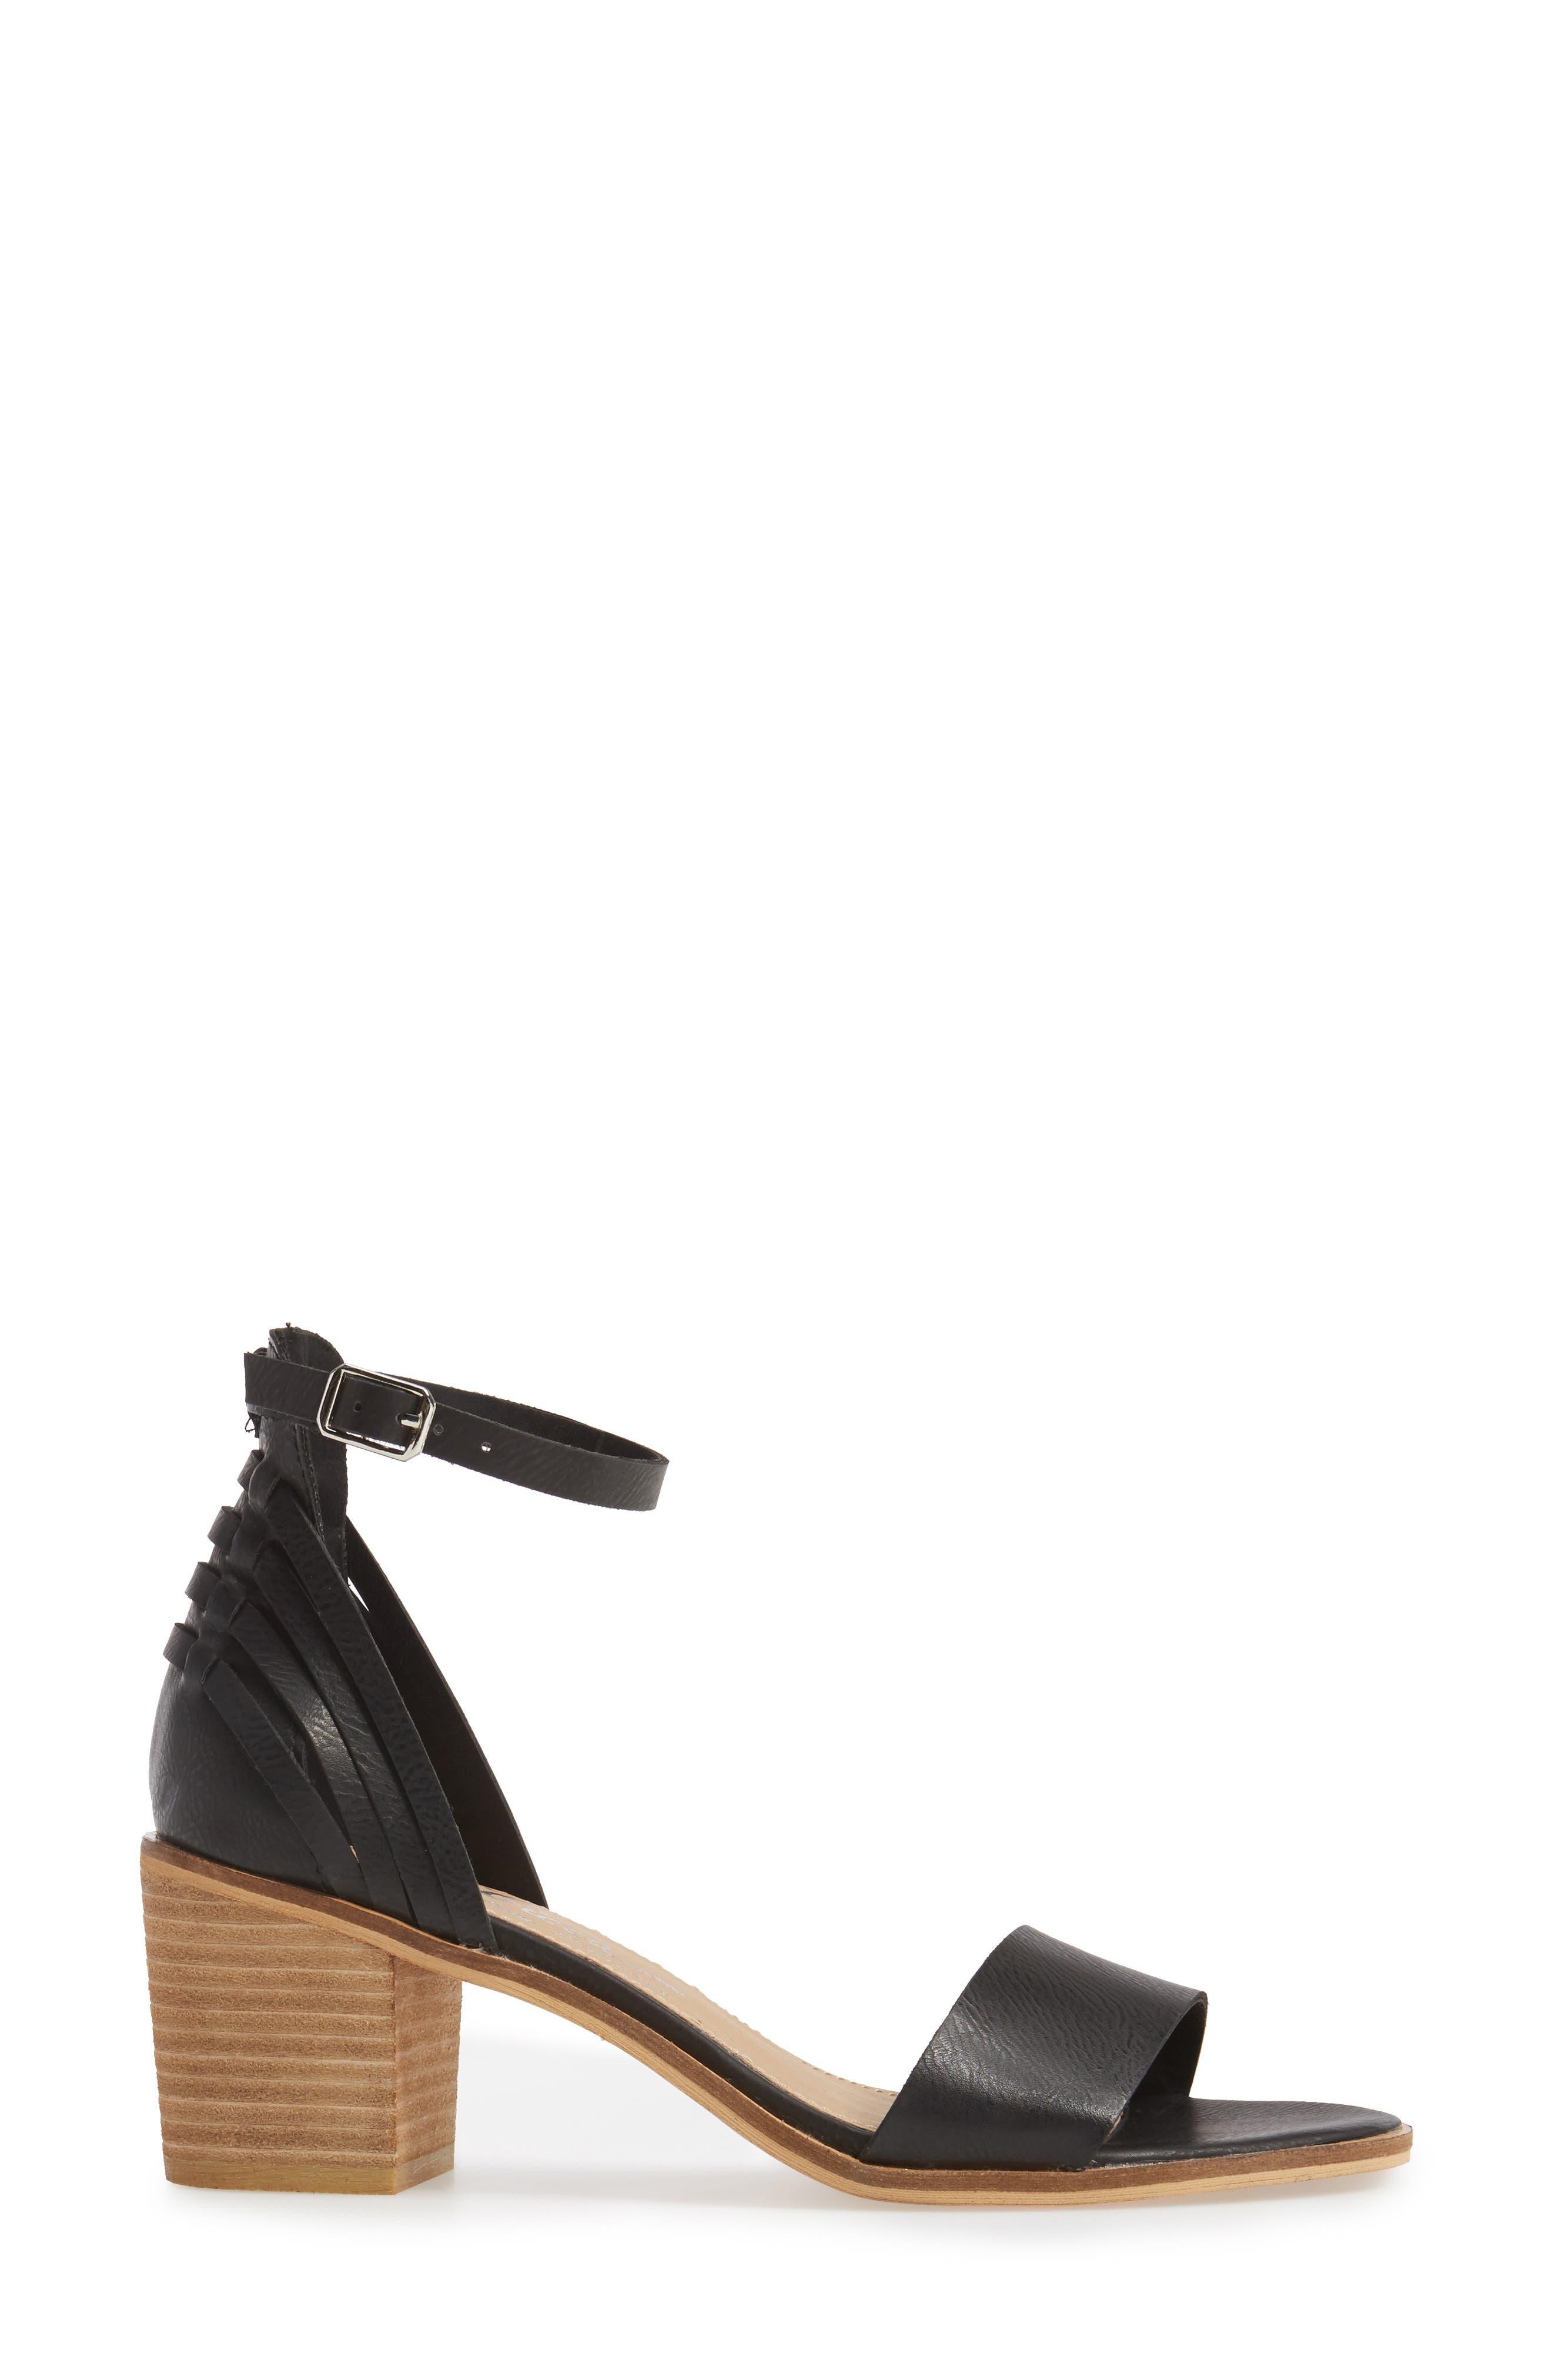 Fars Block Heel Sandal,                             Alternate thumbnail 3, color,                             001